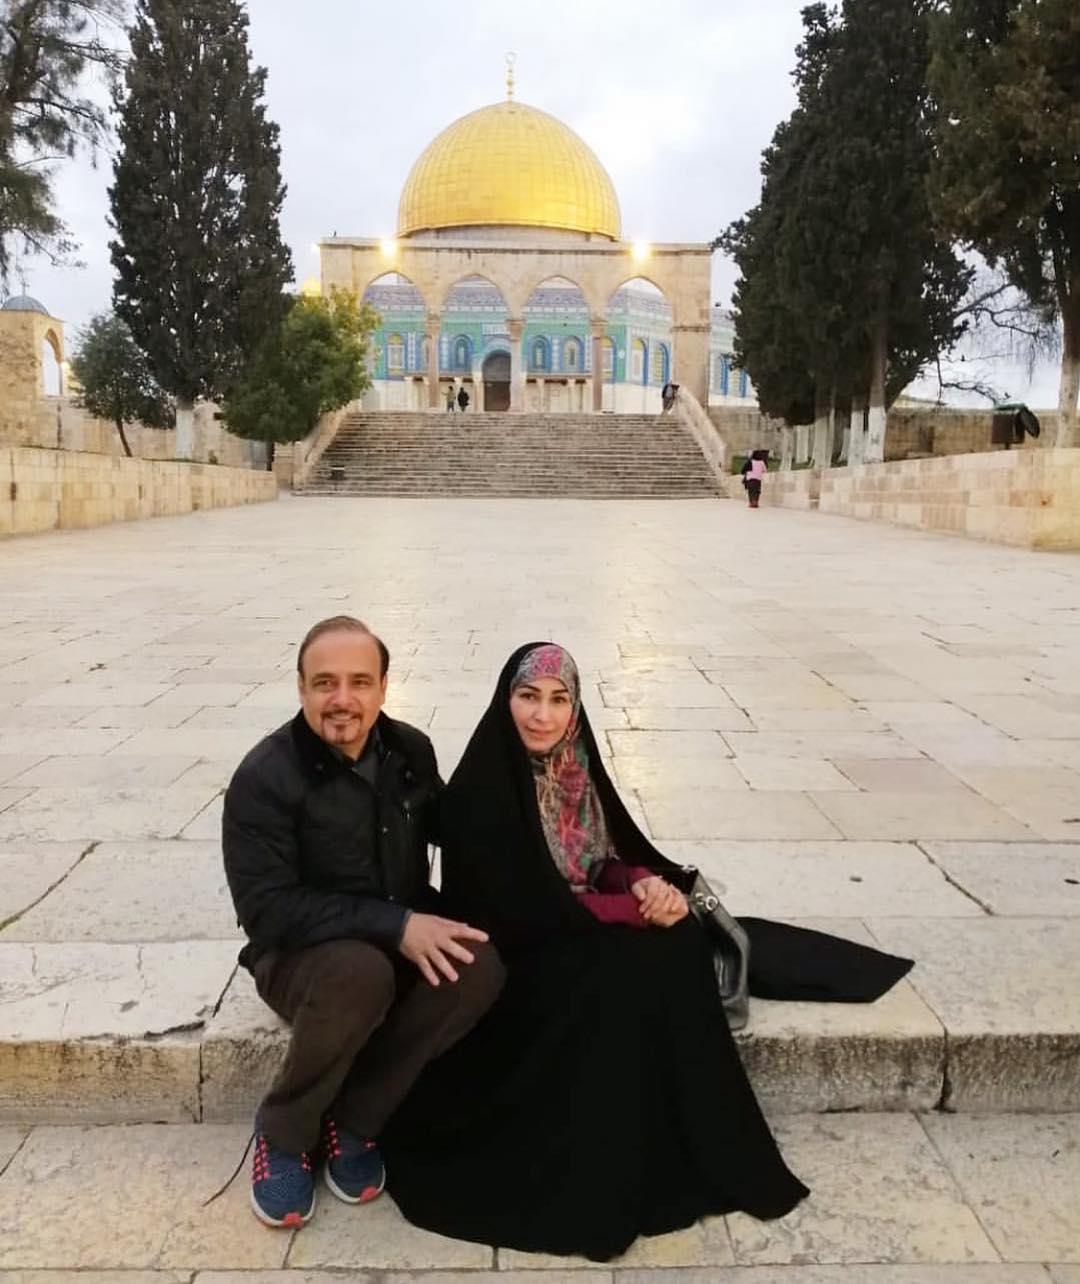 Reema with her Husband Visited Masjid Al Aqsa Jerusalem